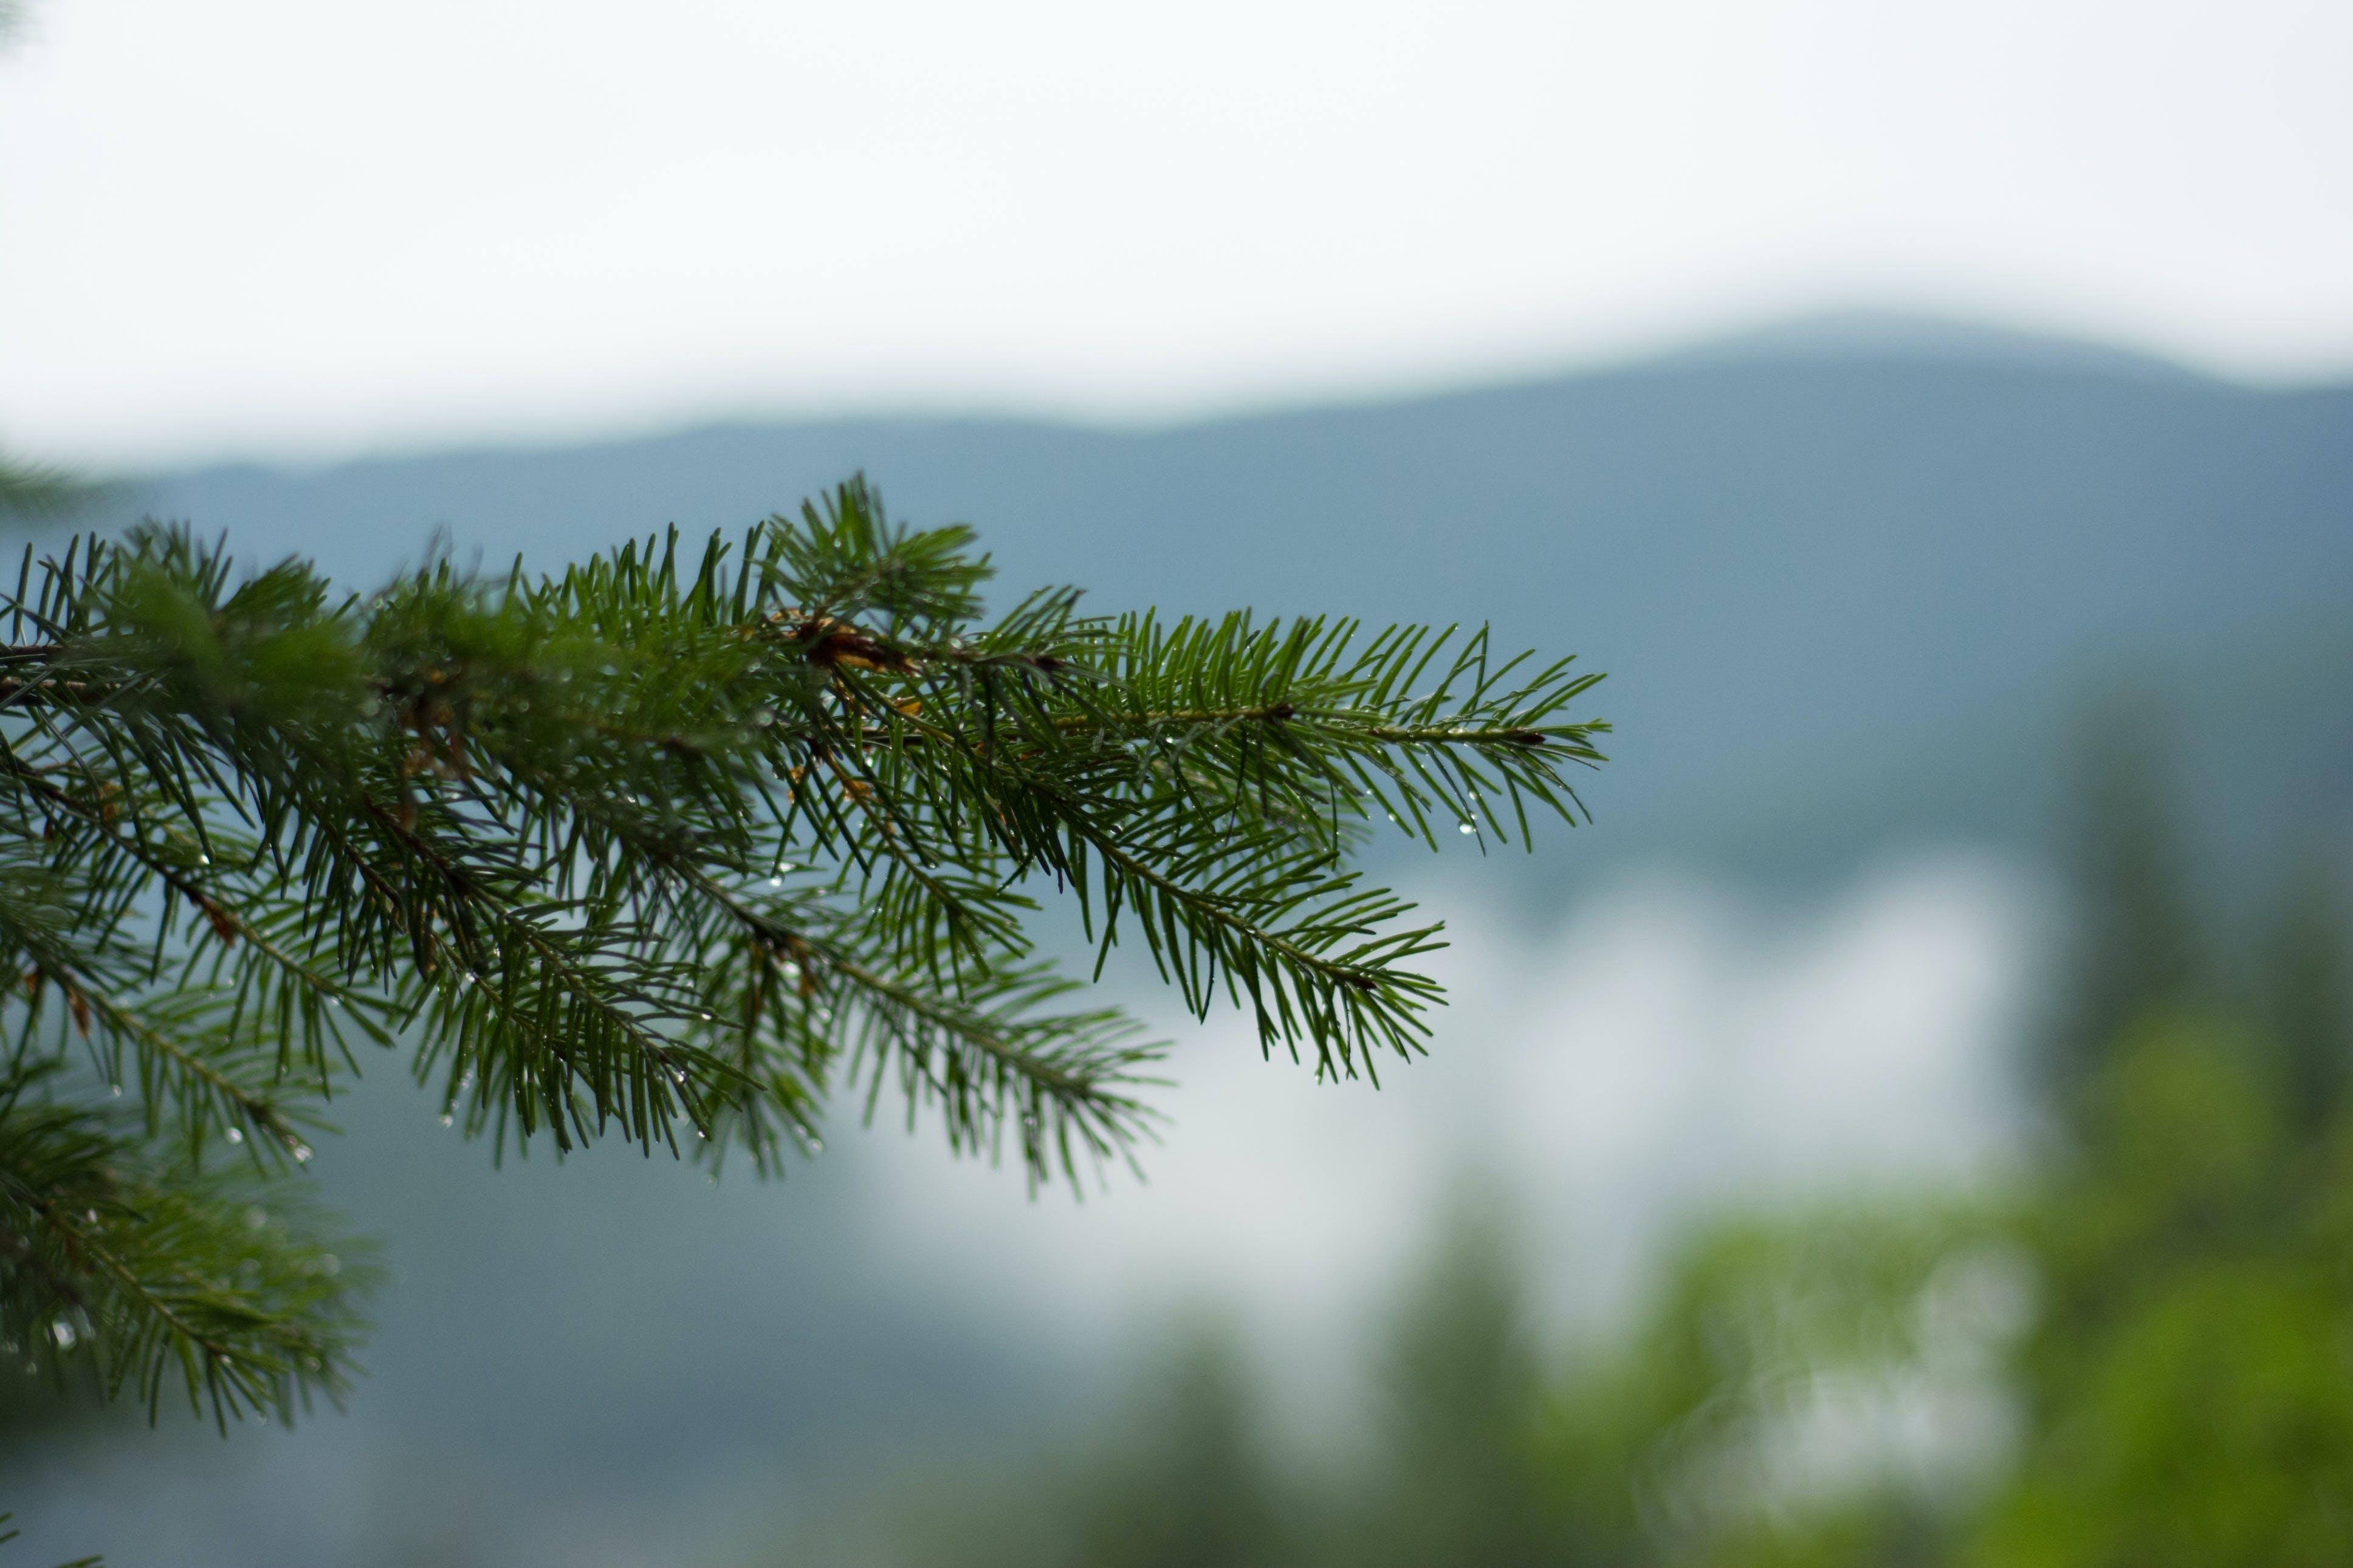 Free stock photo of branch, pine, tree